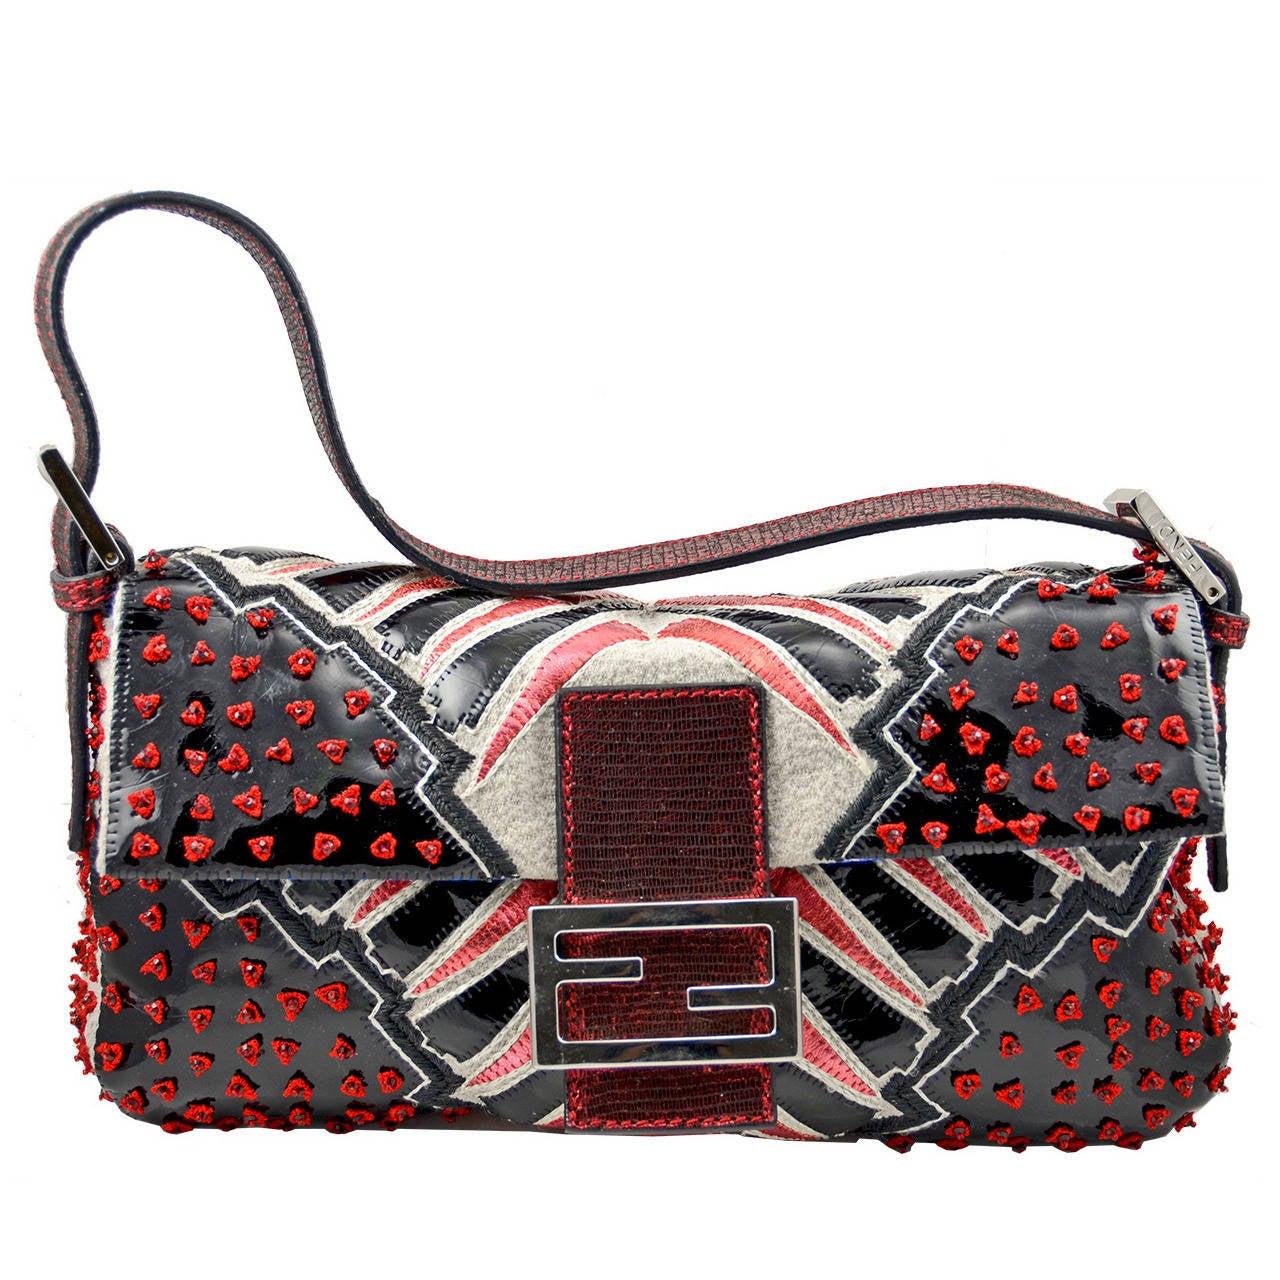 16fd18bfbda6 buy fendi baguette bag price cc916 98f77